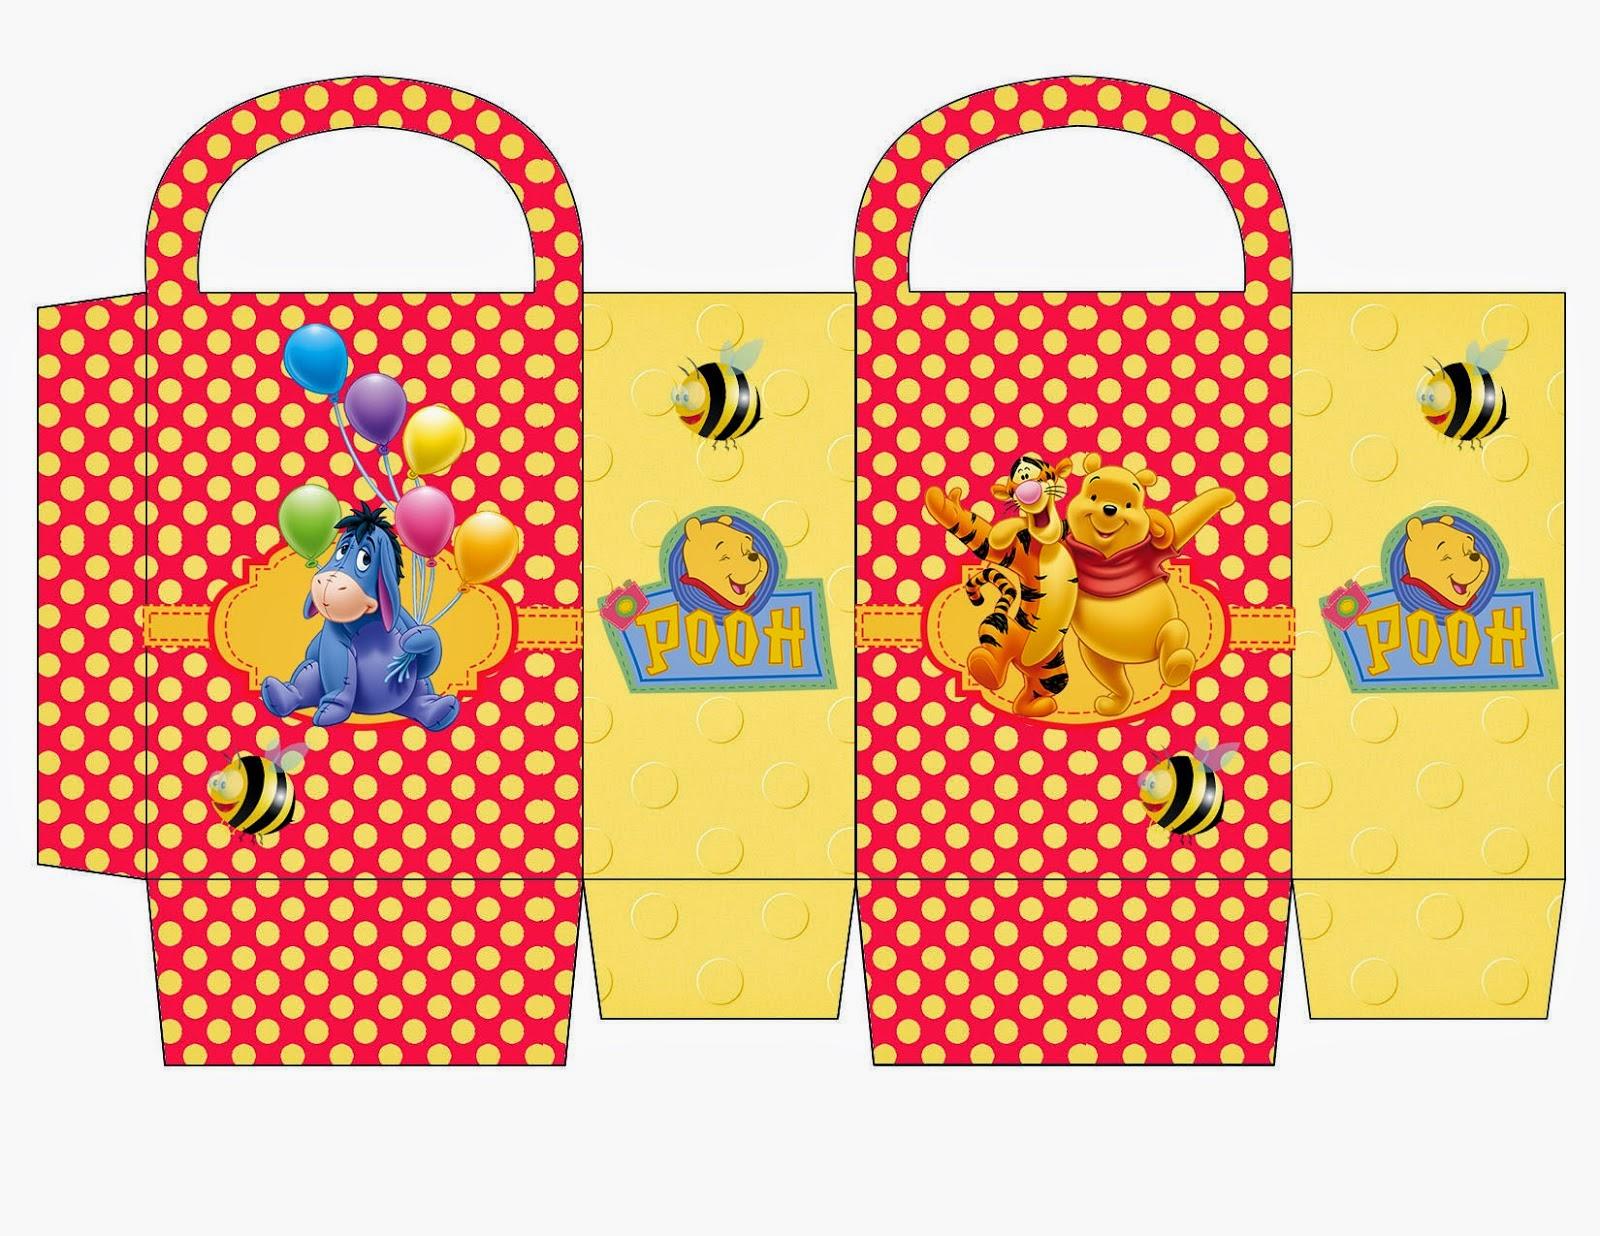 Winnie the Pooh: Bolsa de Papel para Imprimir Gratis.